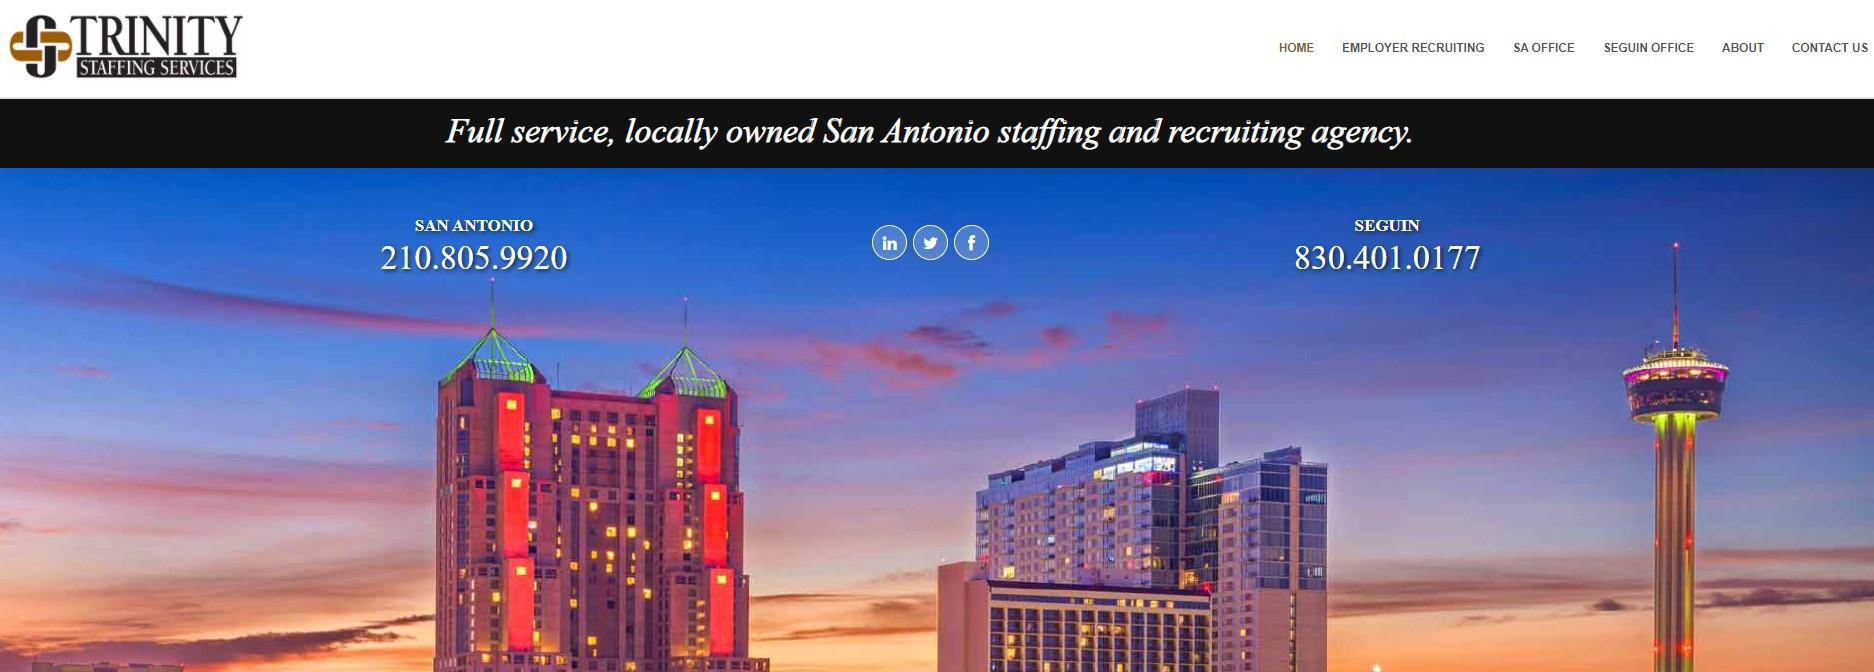 Trinity Staffing - Best San Antonio Staffing Agency